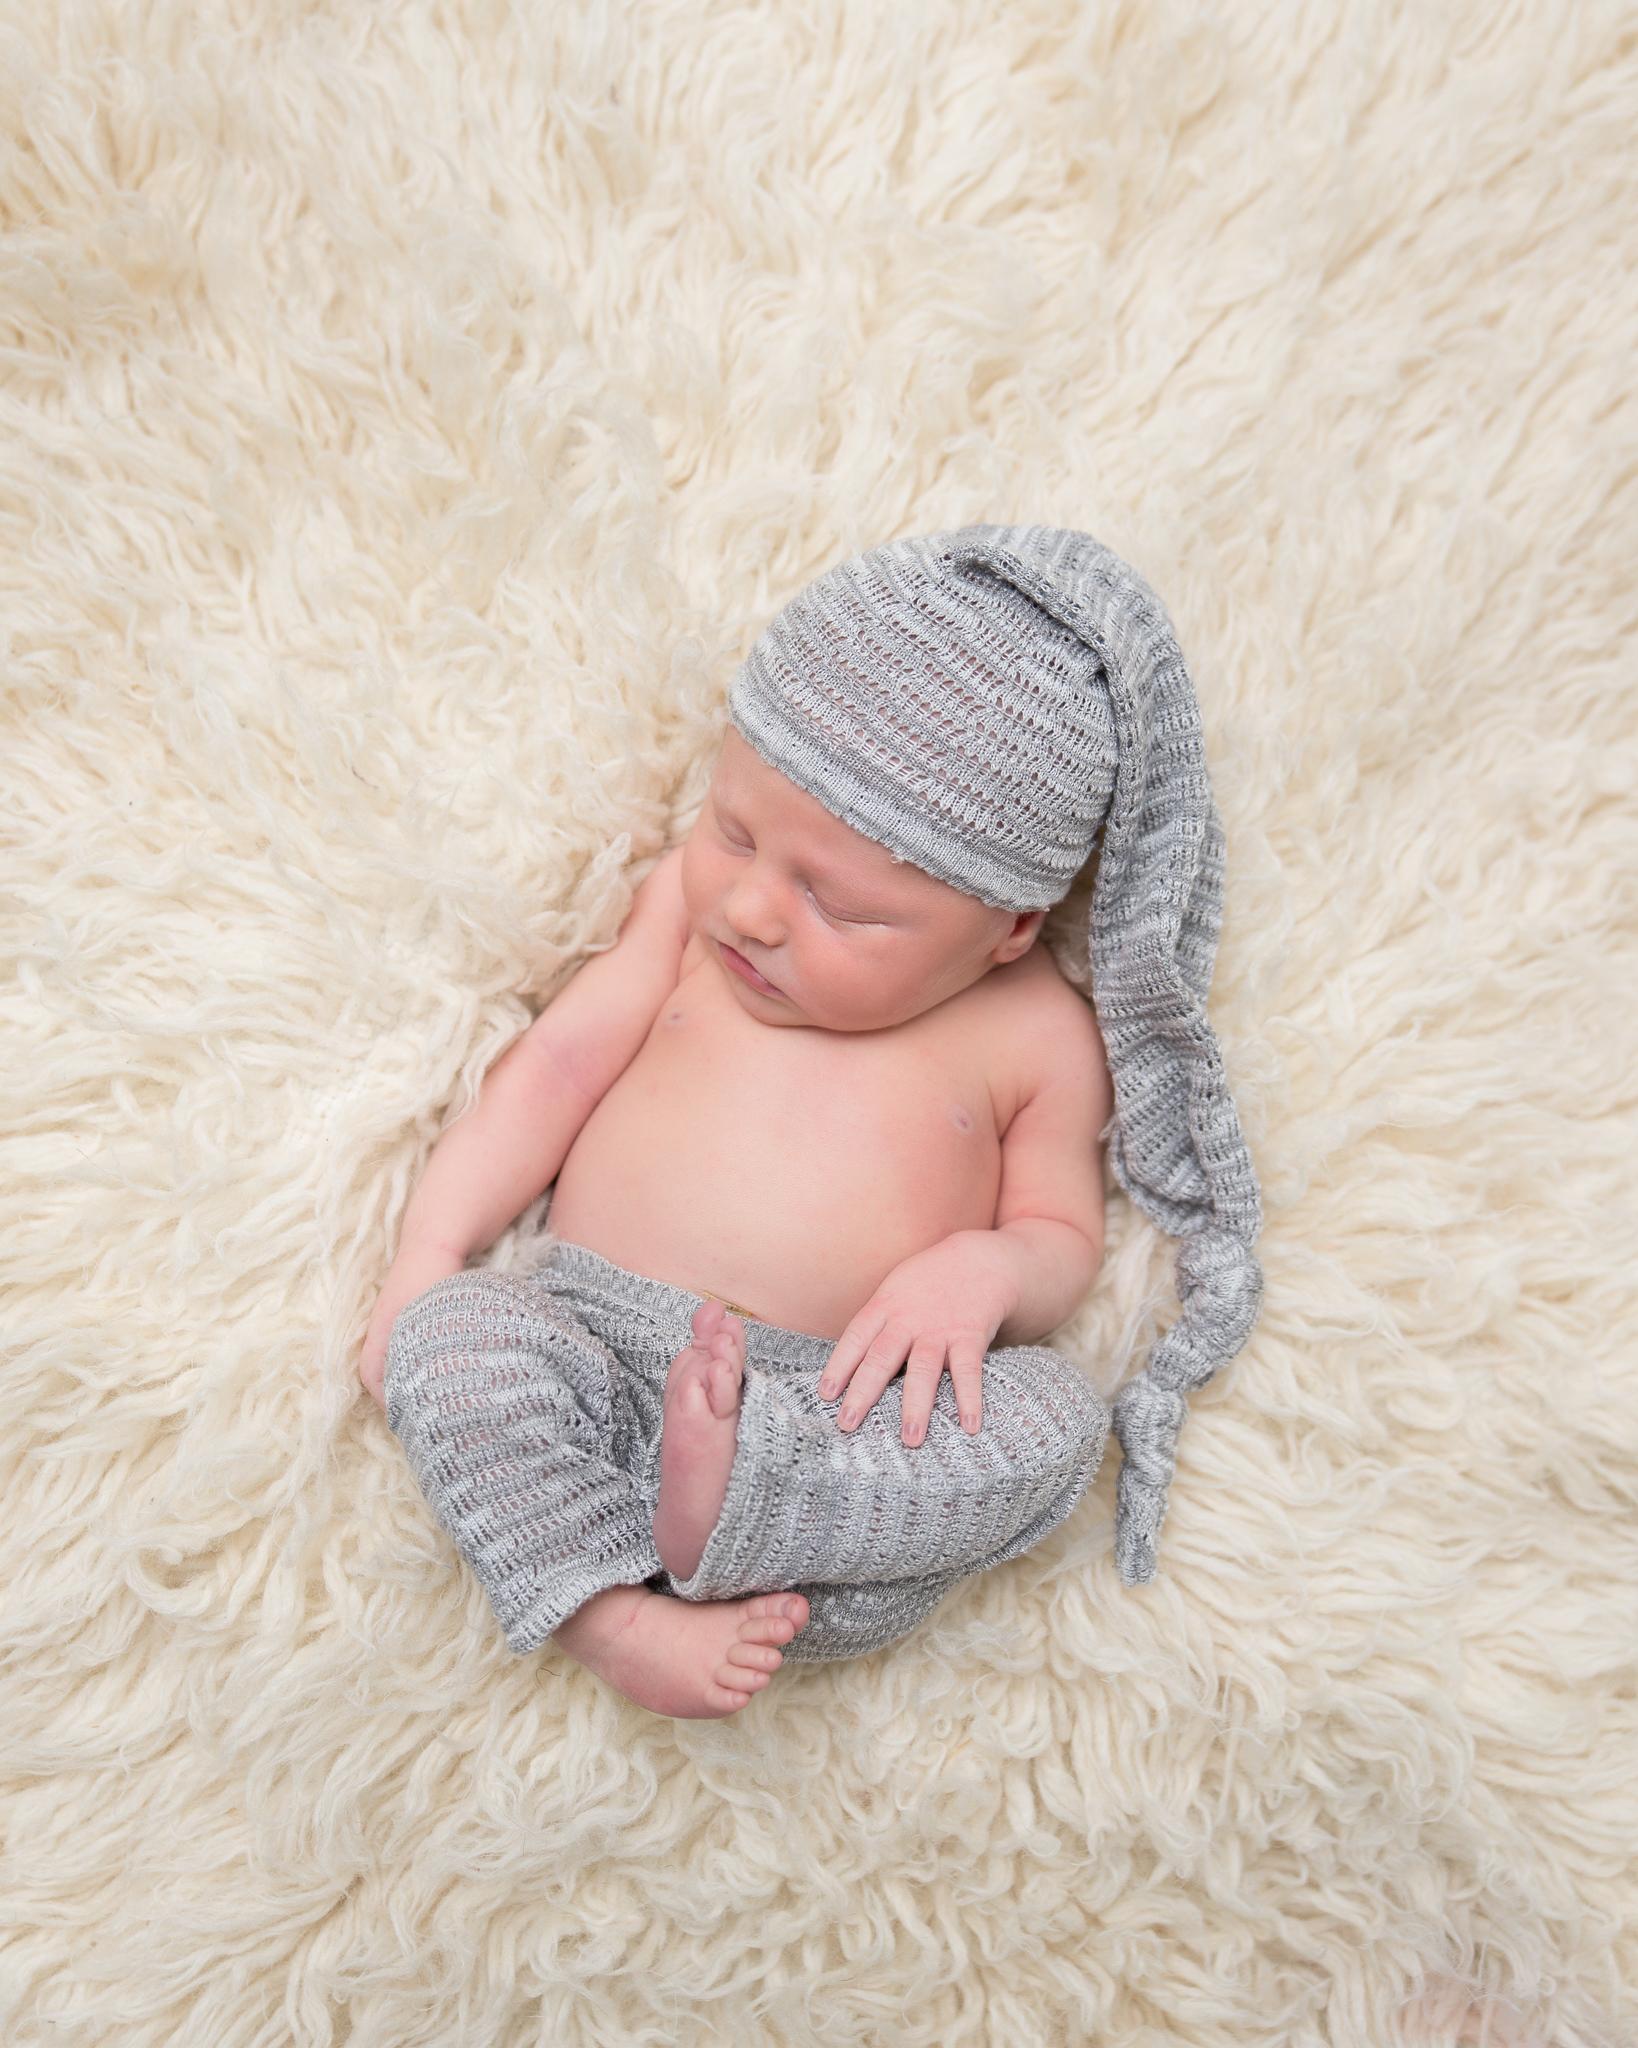 Chevy-chase-md-newborn-photographer58.jpg